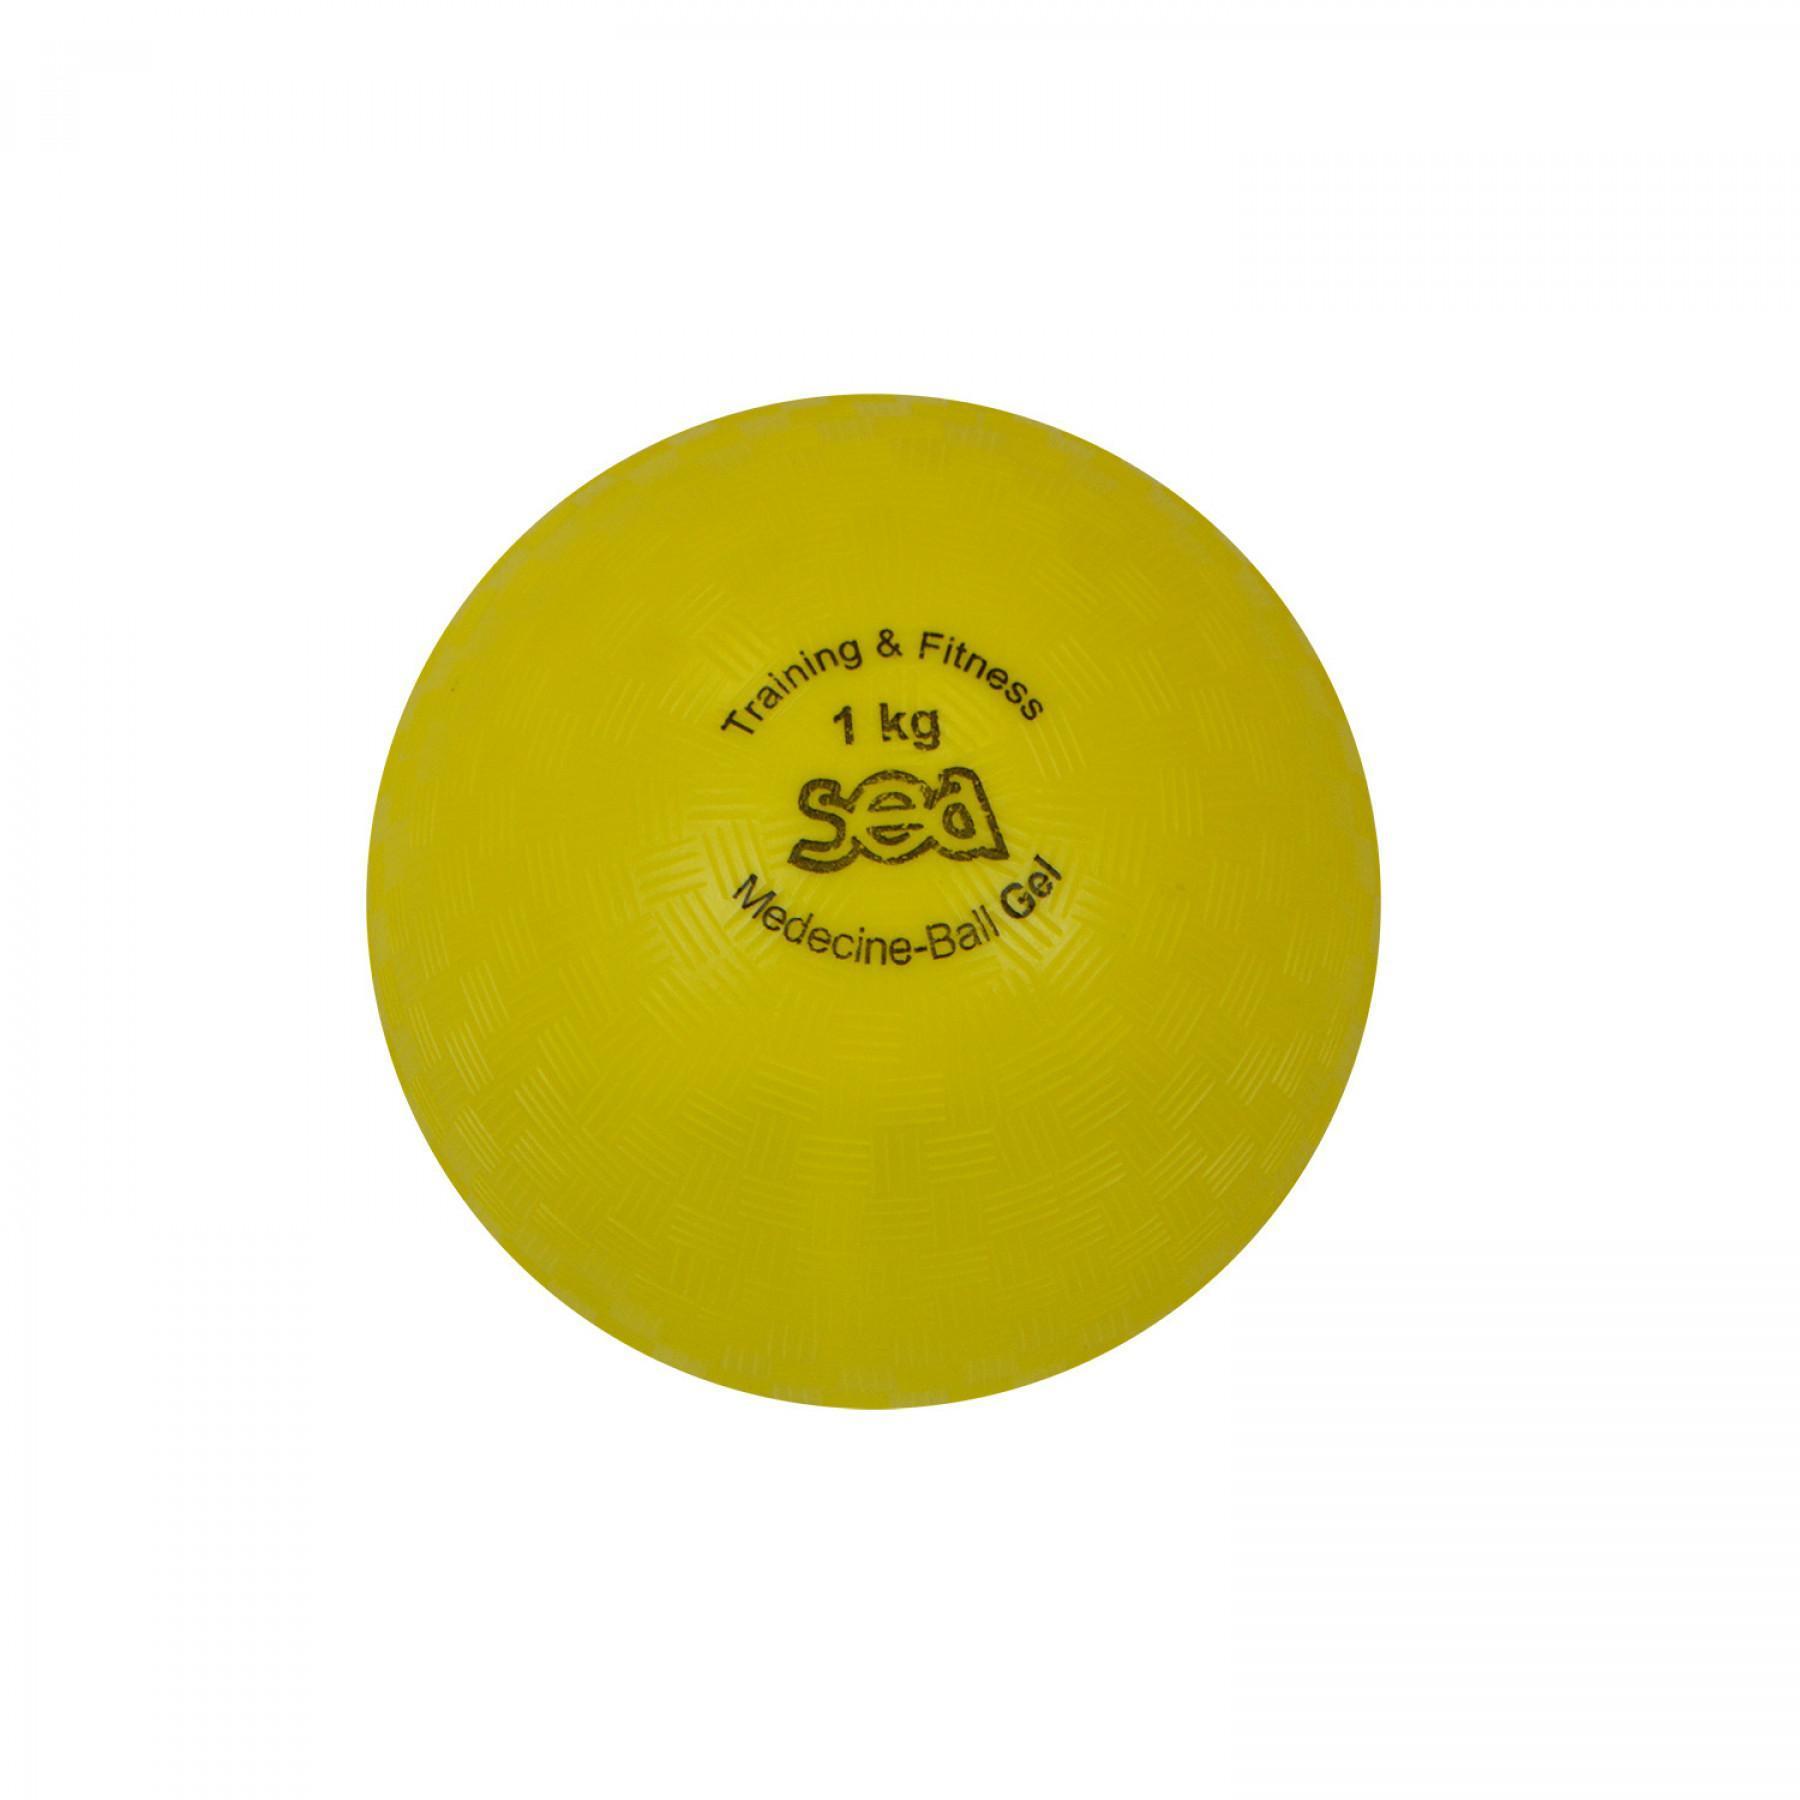 Medicine ball gel 1kg Sporti France Sea